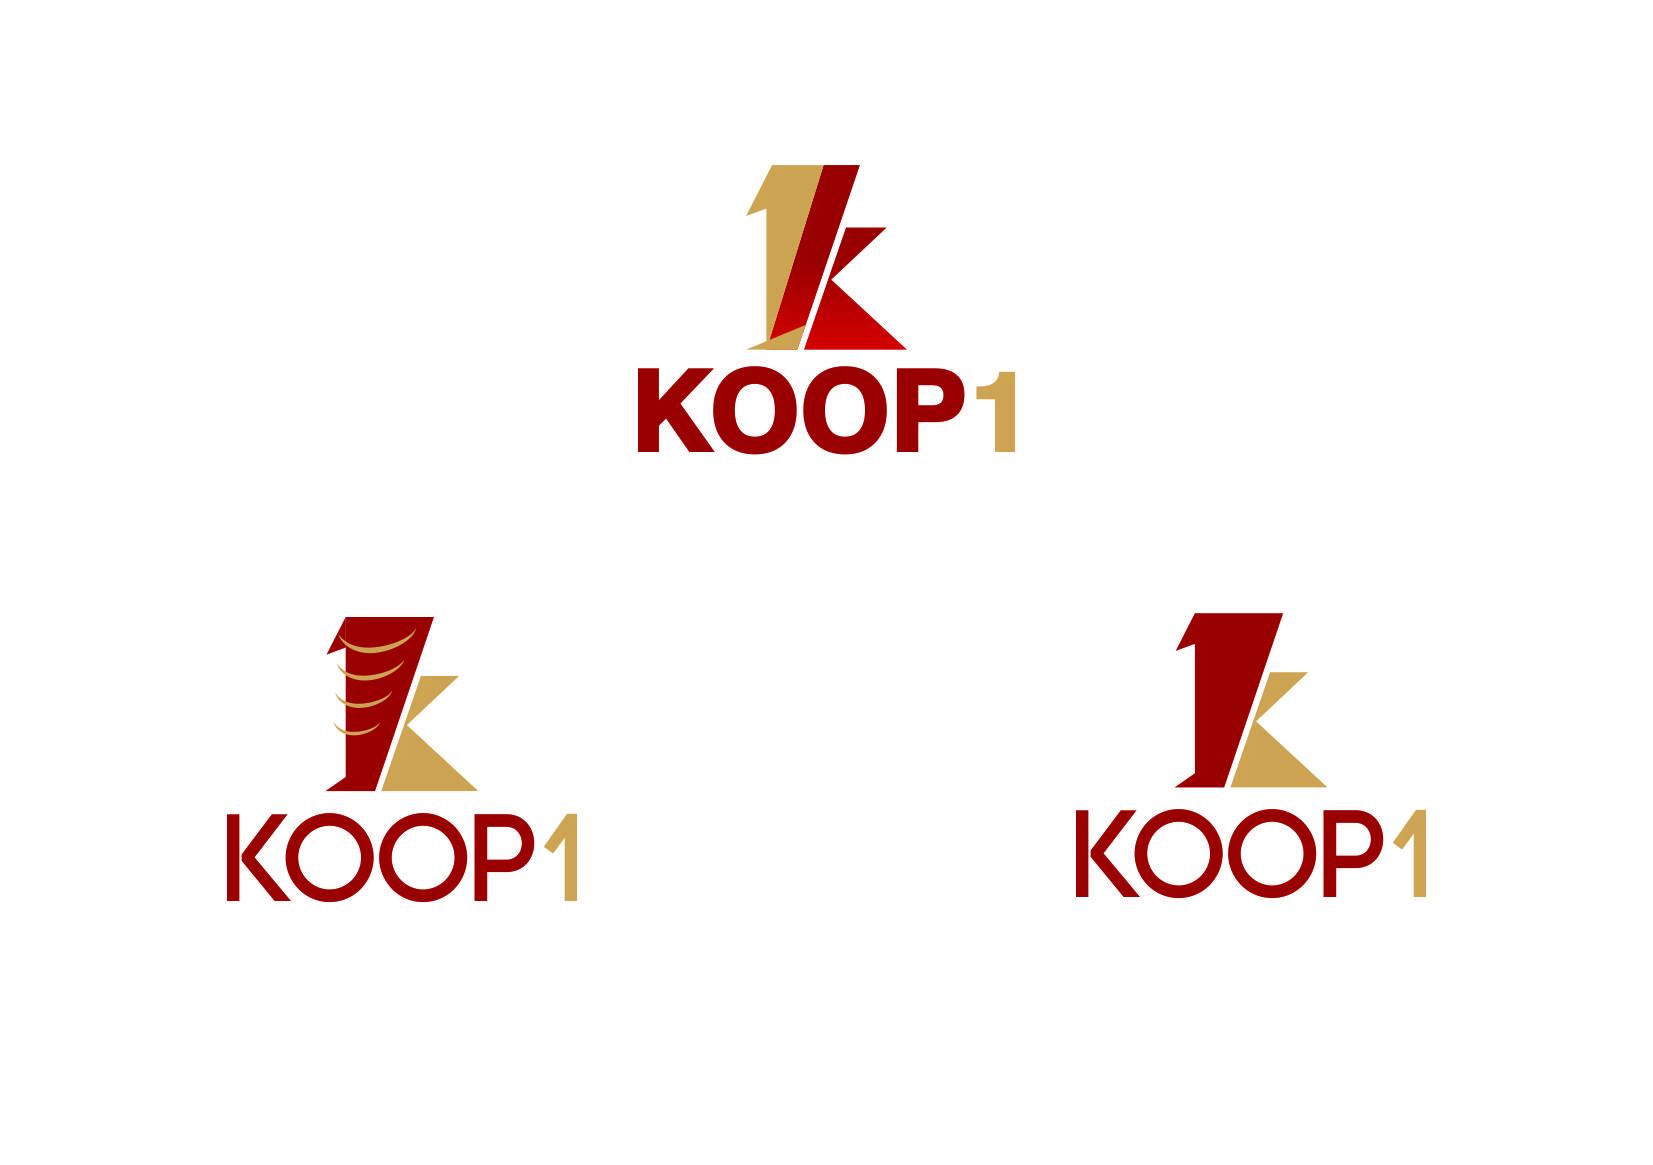 Logo Design by Ravi Shanker - Entry No. 218 in the Logo Design Contest Creative Logo Design for KOOP 1.